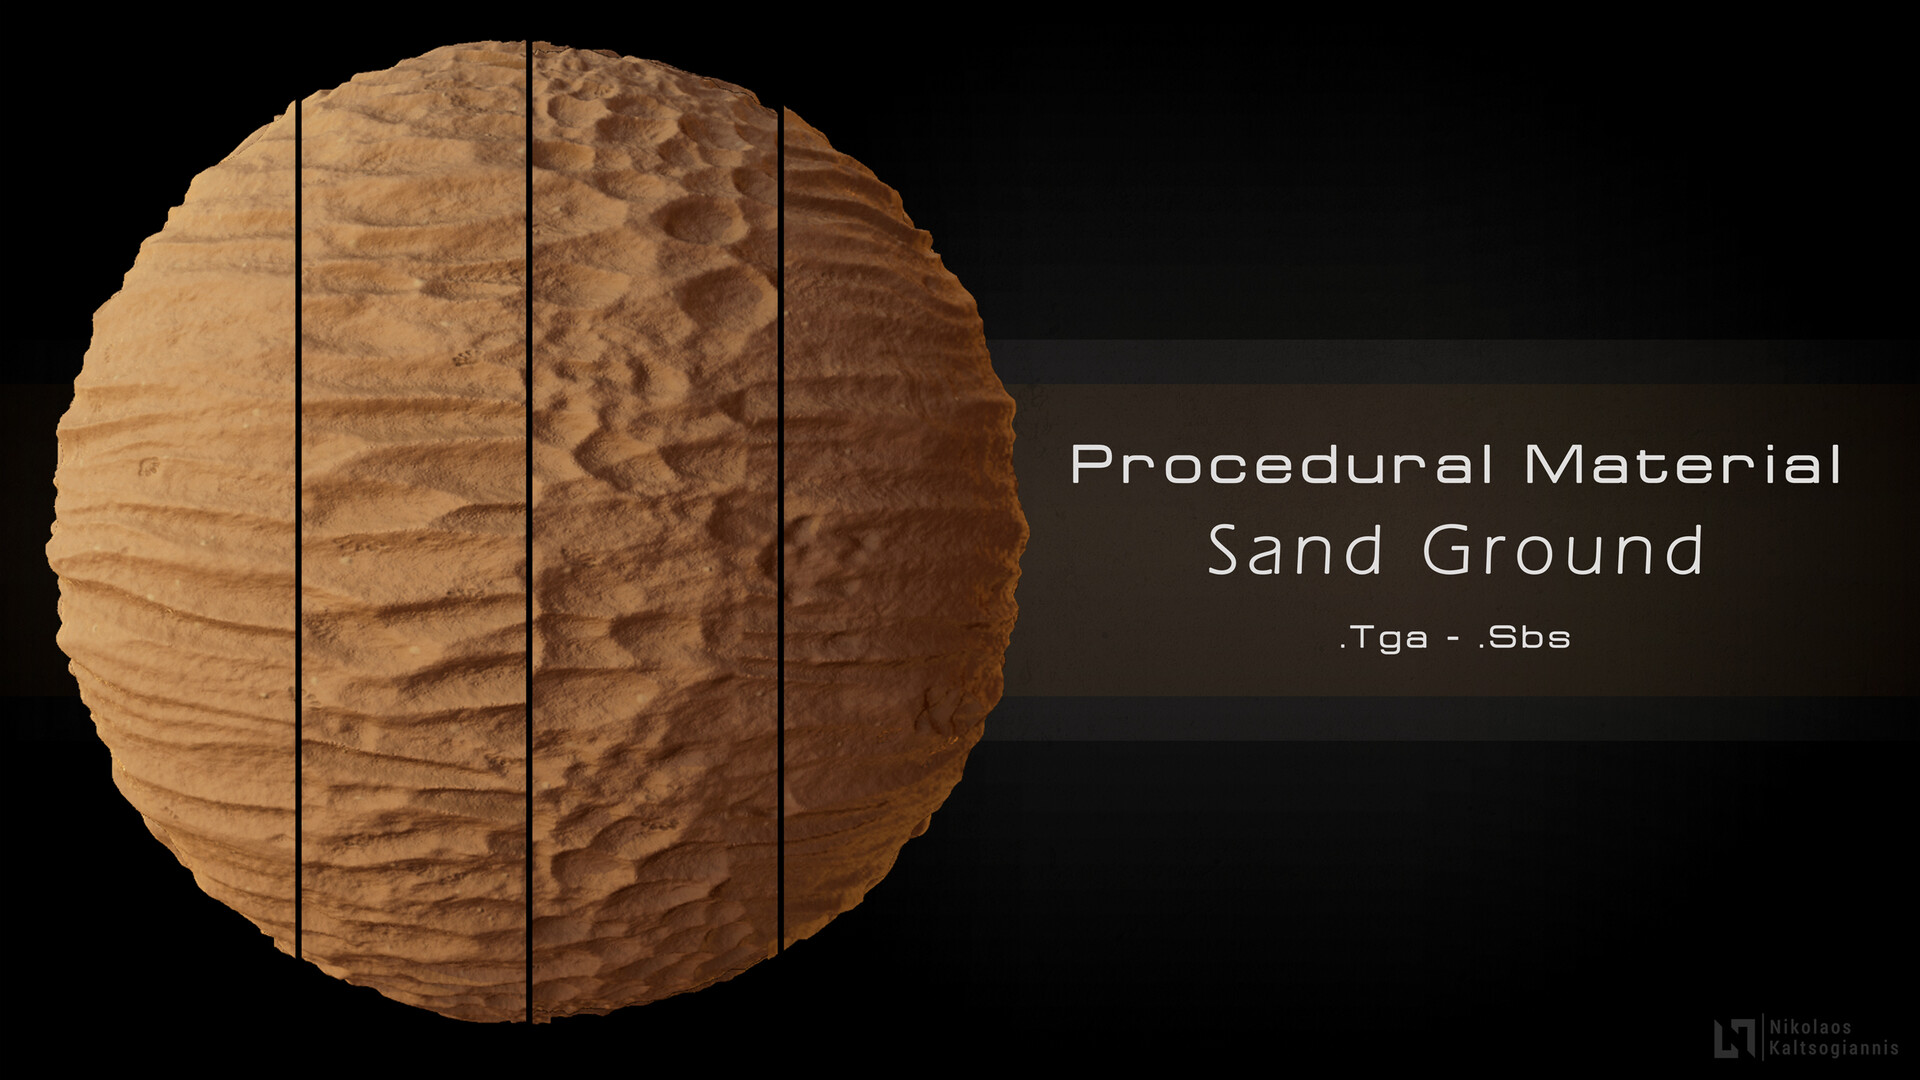 Nikolaos kaltsogiannis nickoxart material desert sand 01 shop thumbnail 01